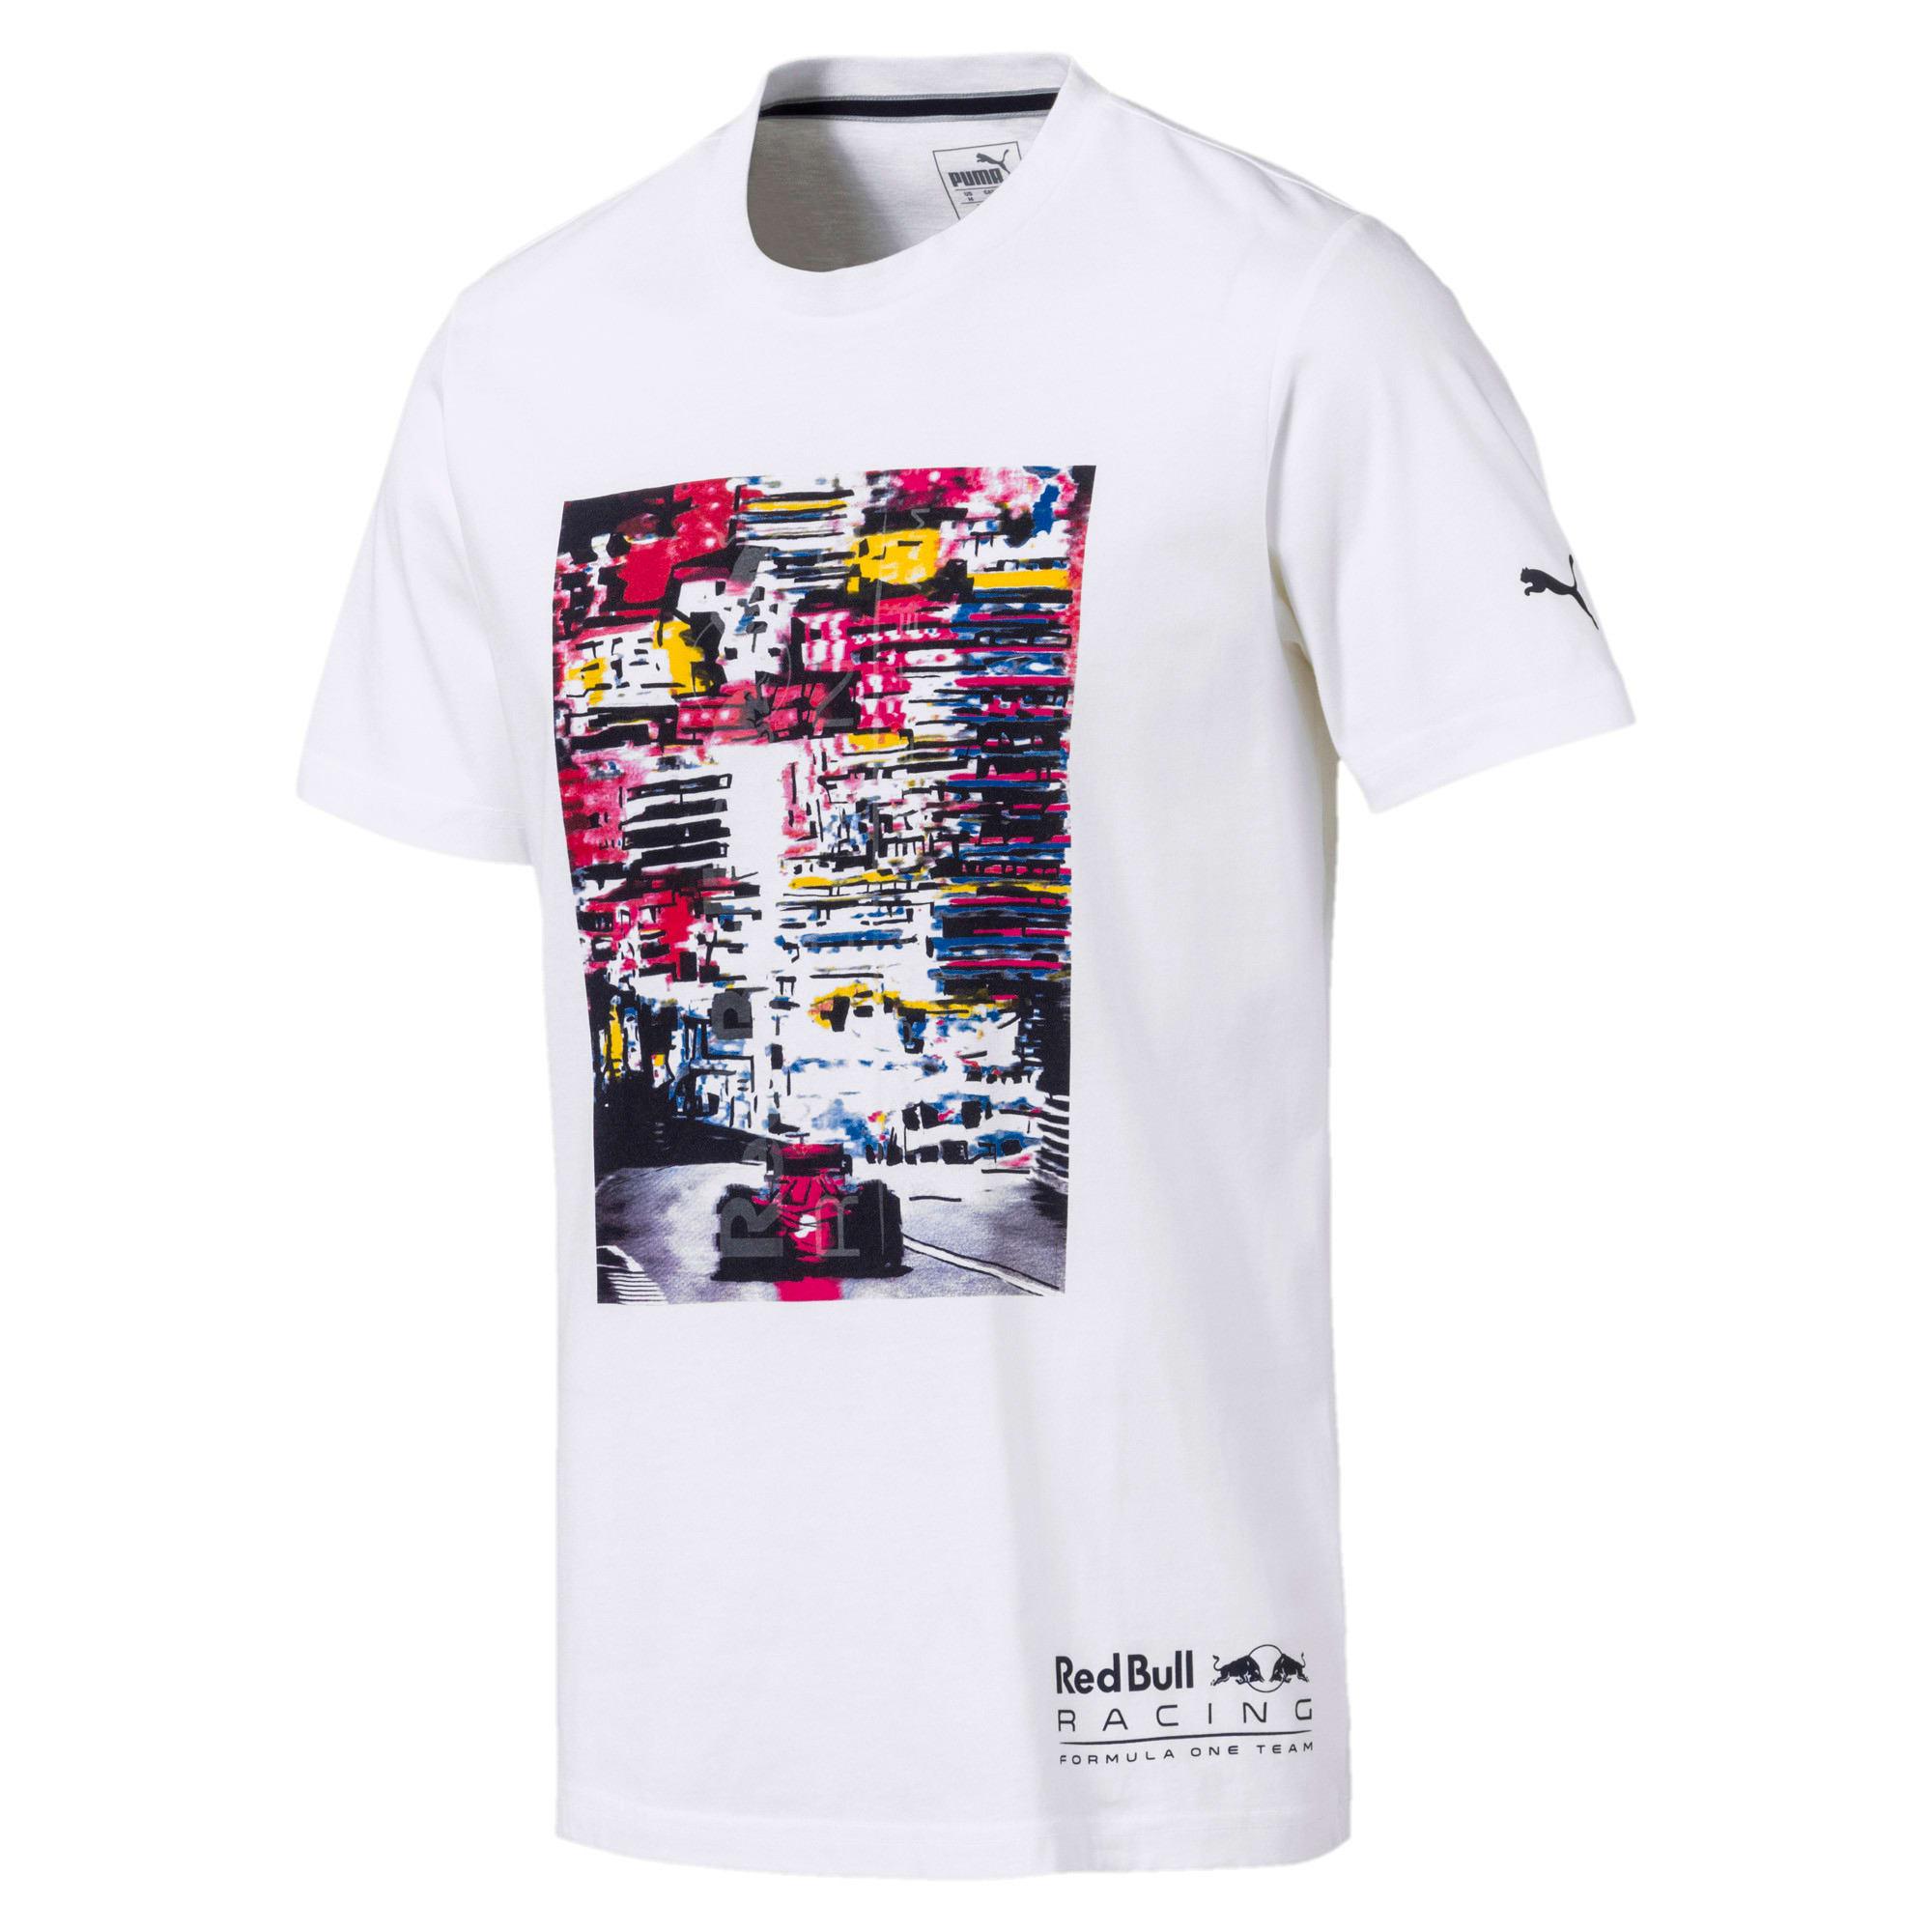 Thumbnail 1 of Red Bull Racing Lifestyle Men's Graphic T-Shirt, Puma White, medium